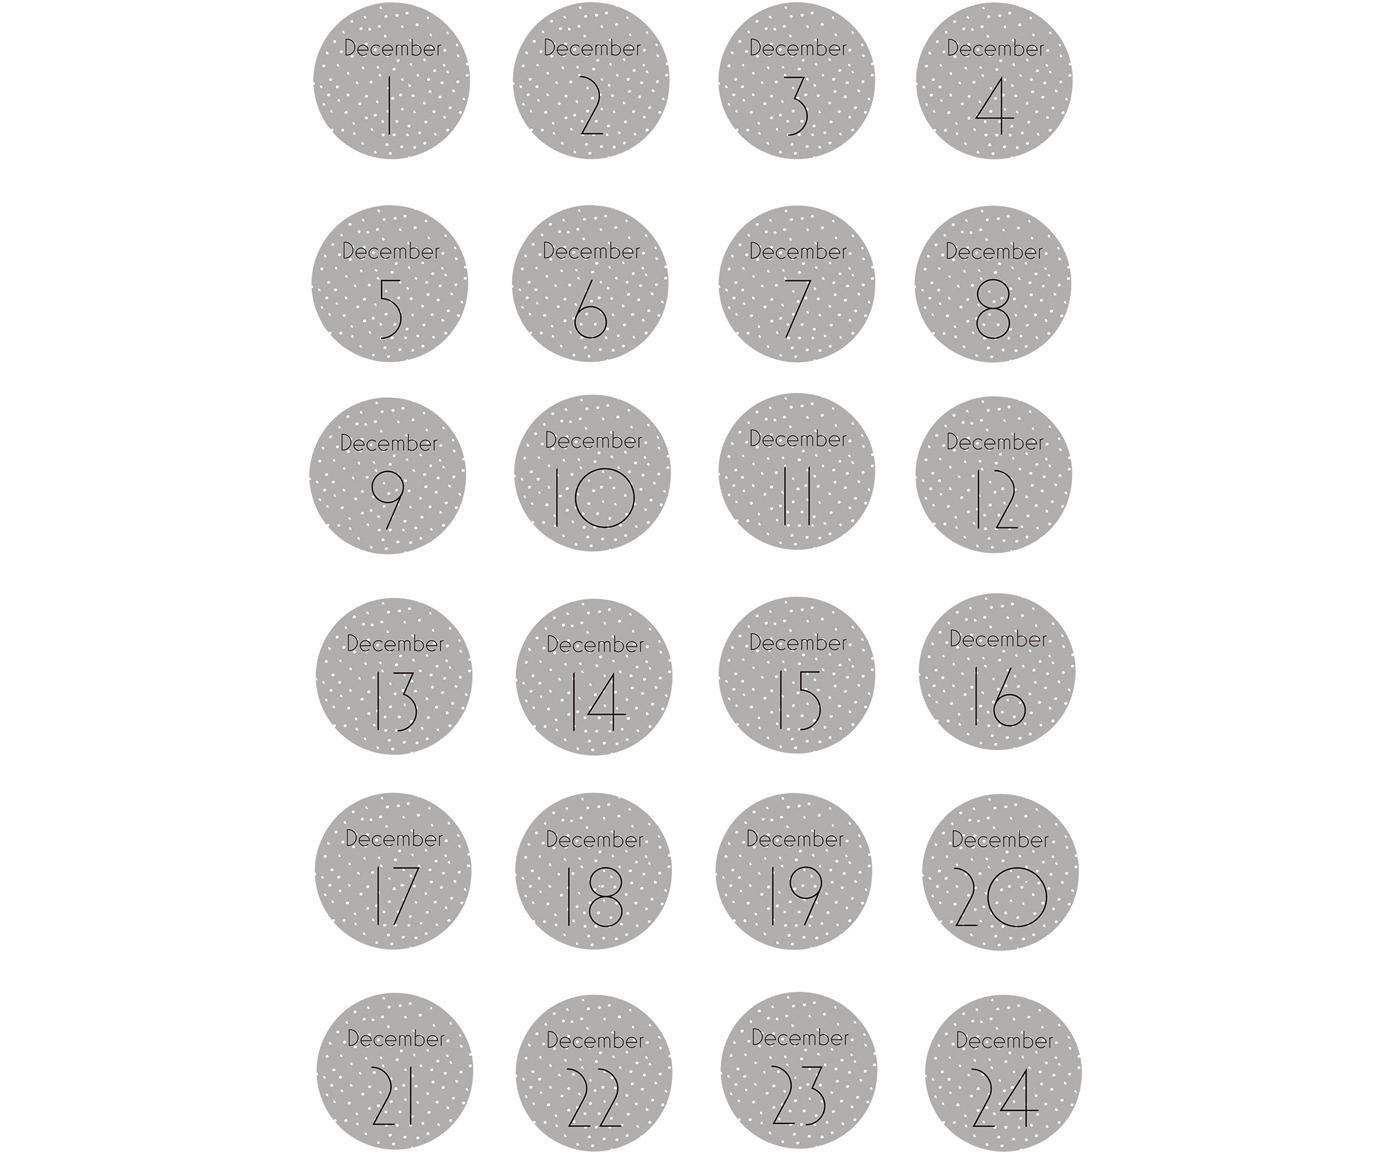 Aufkleber-Set Advent, 24-tlg., Papier, Grau, Weiß, Schwarz, Ø 5 cm